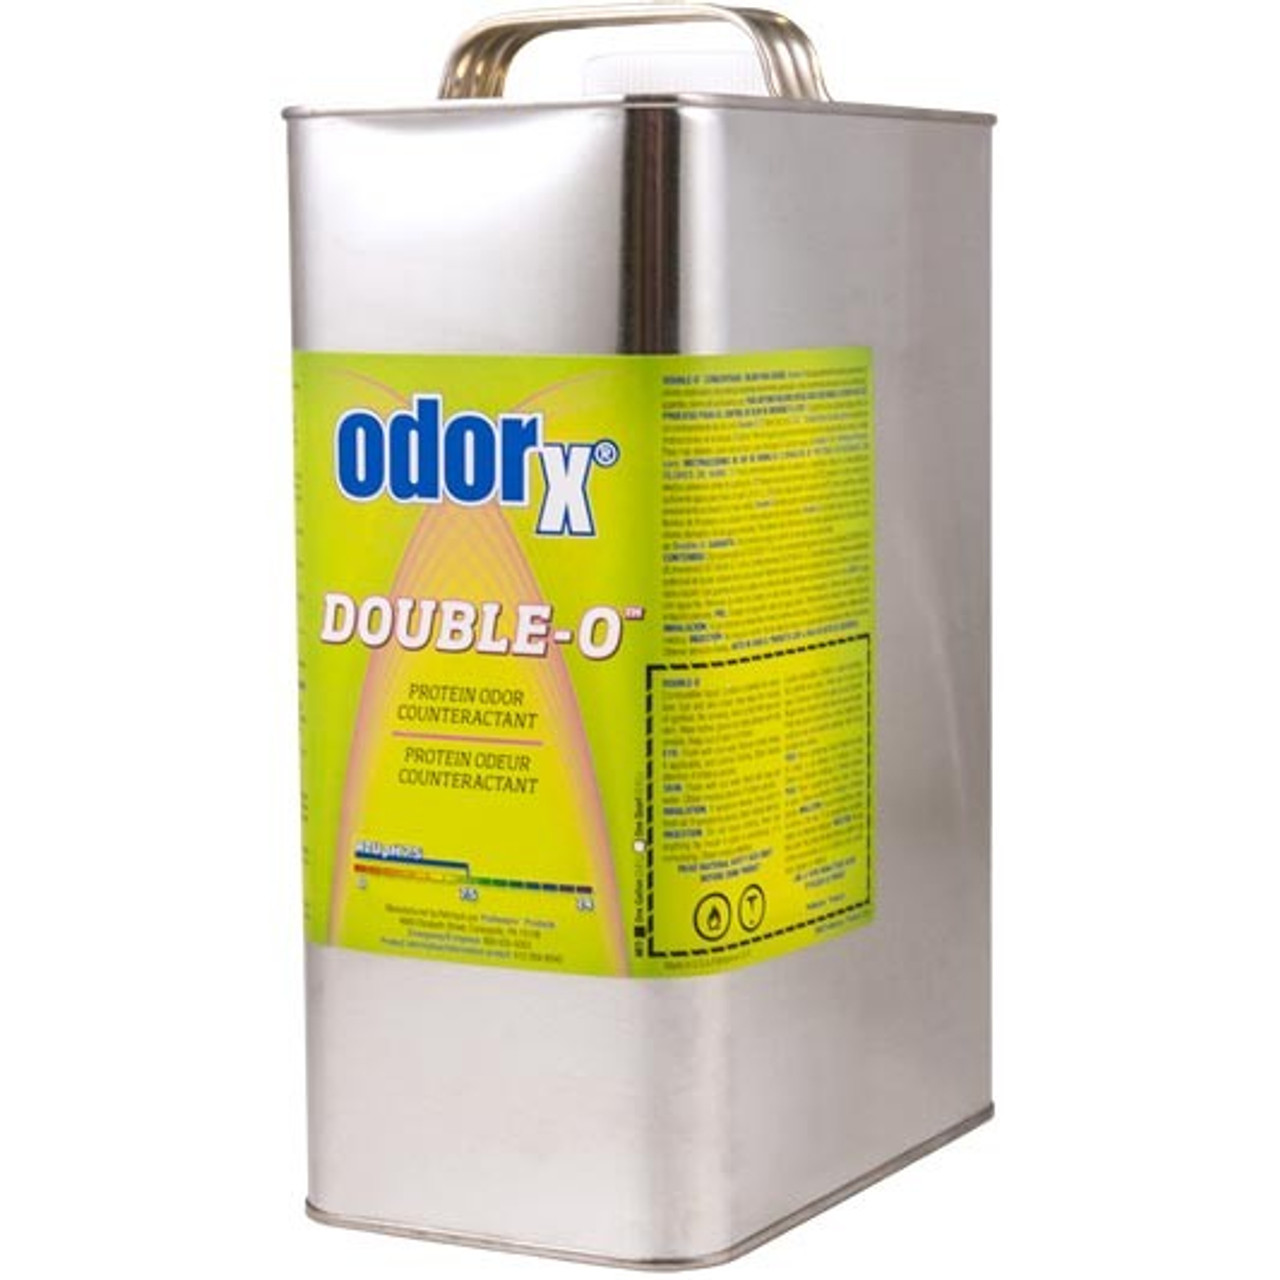 ODORx Double-O Protein Smoke Odor Counteractant and Deodorant